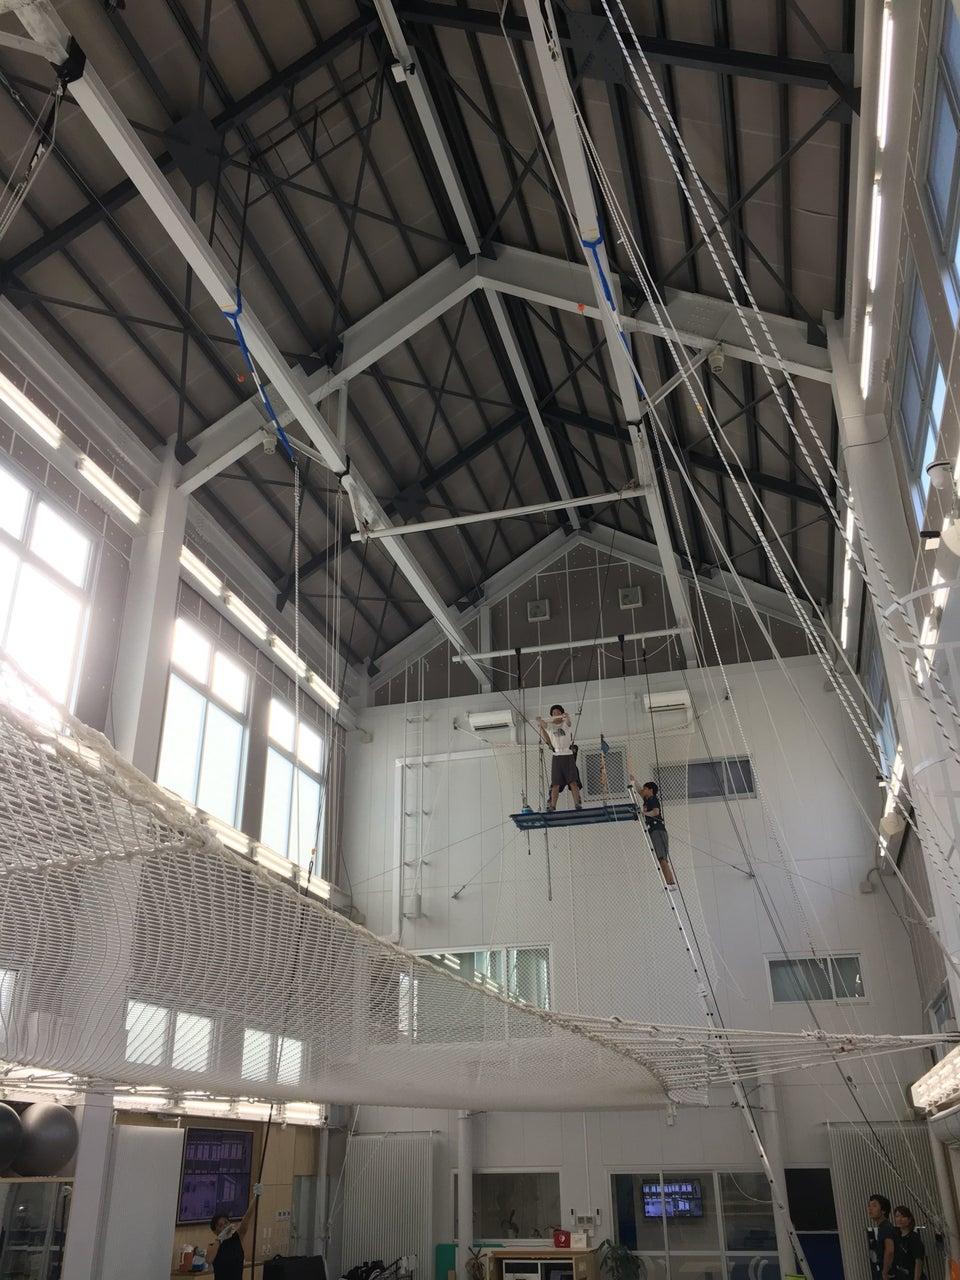 Fly'n Fit trapeze studio空中複合設施